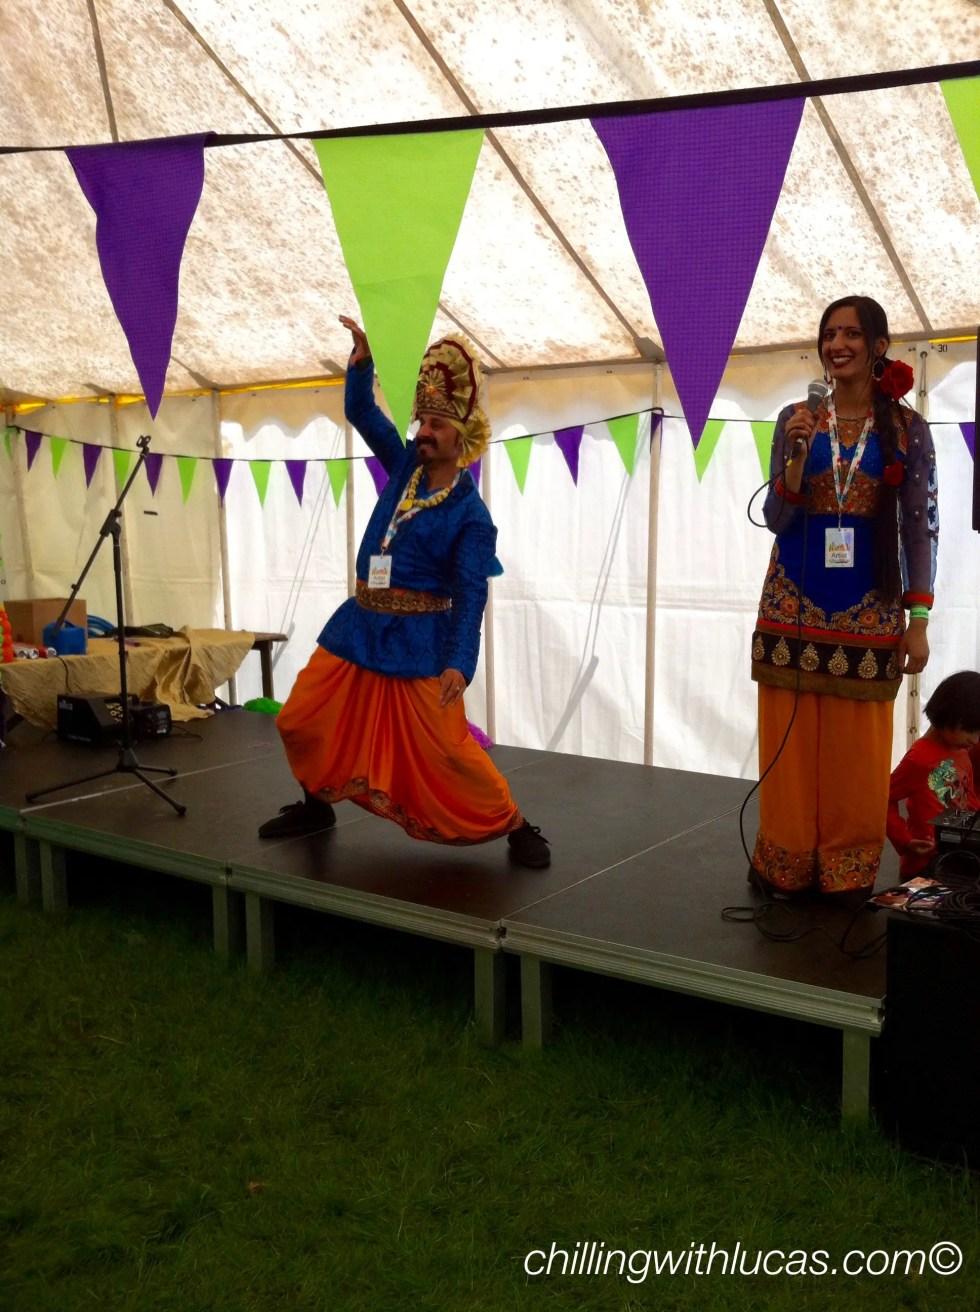 Geronimo festival